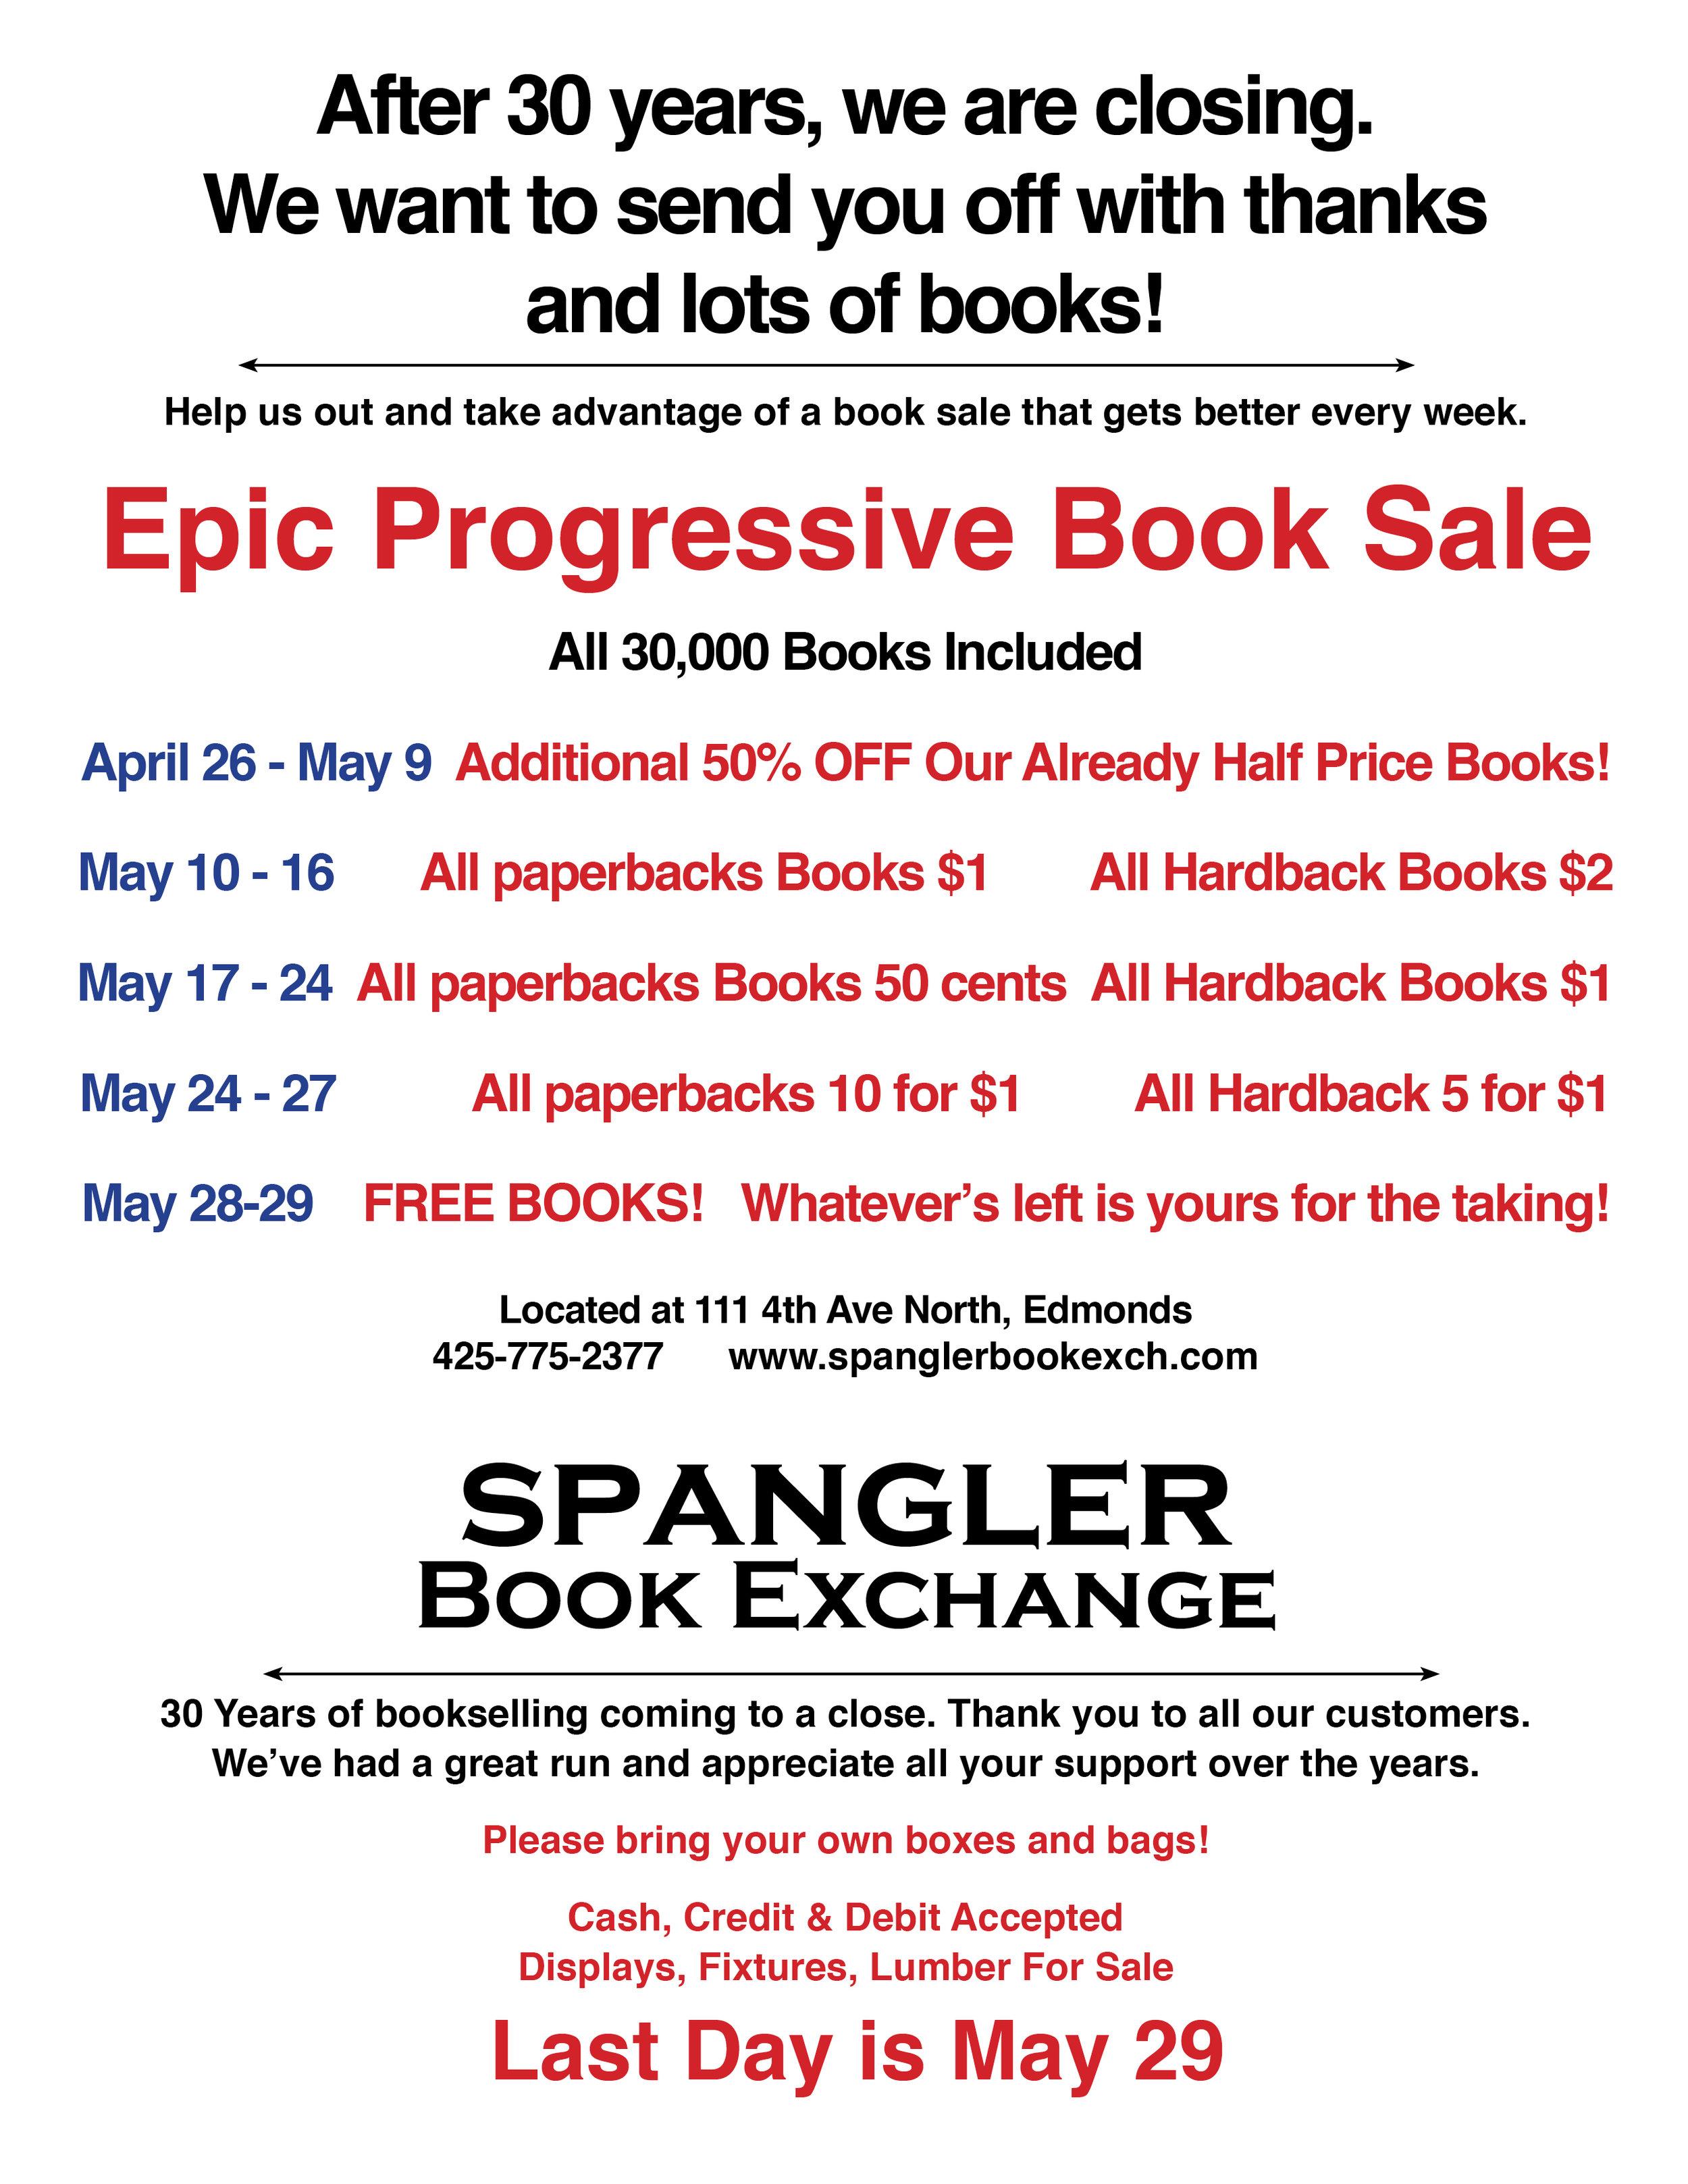 Spangler Epic Closing Sale 1 Page.jpg